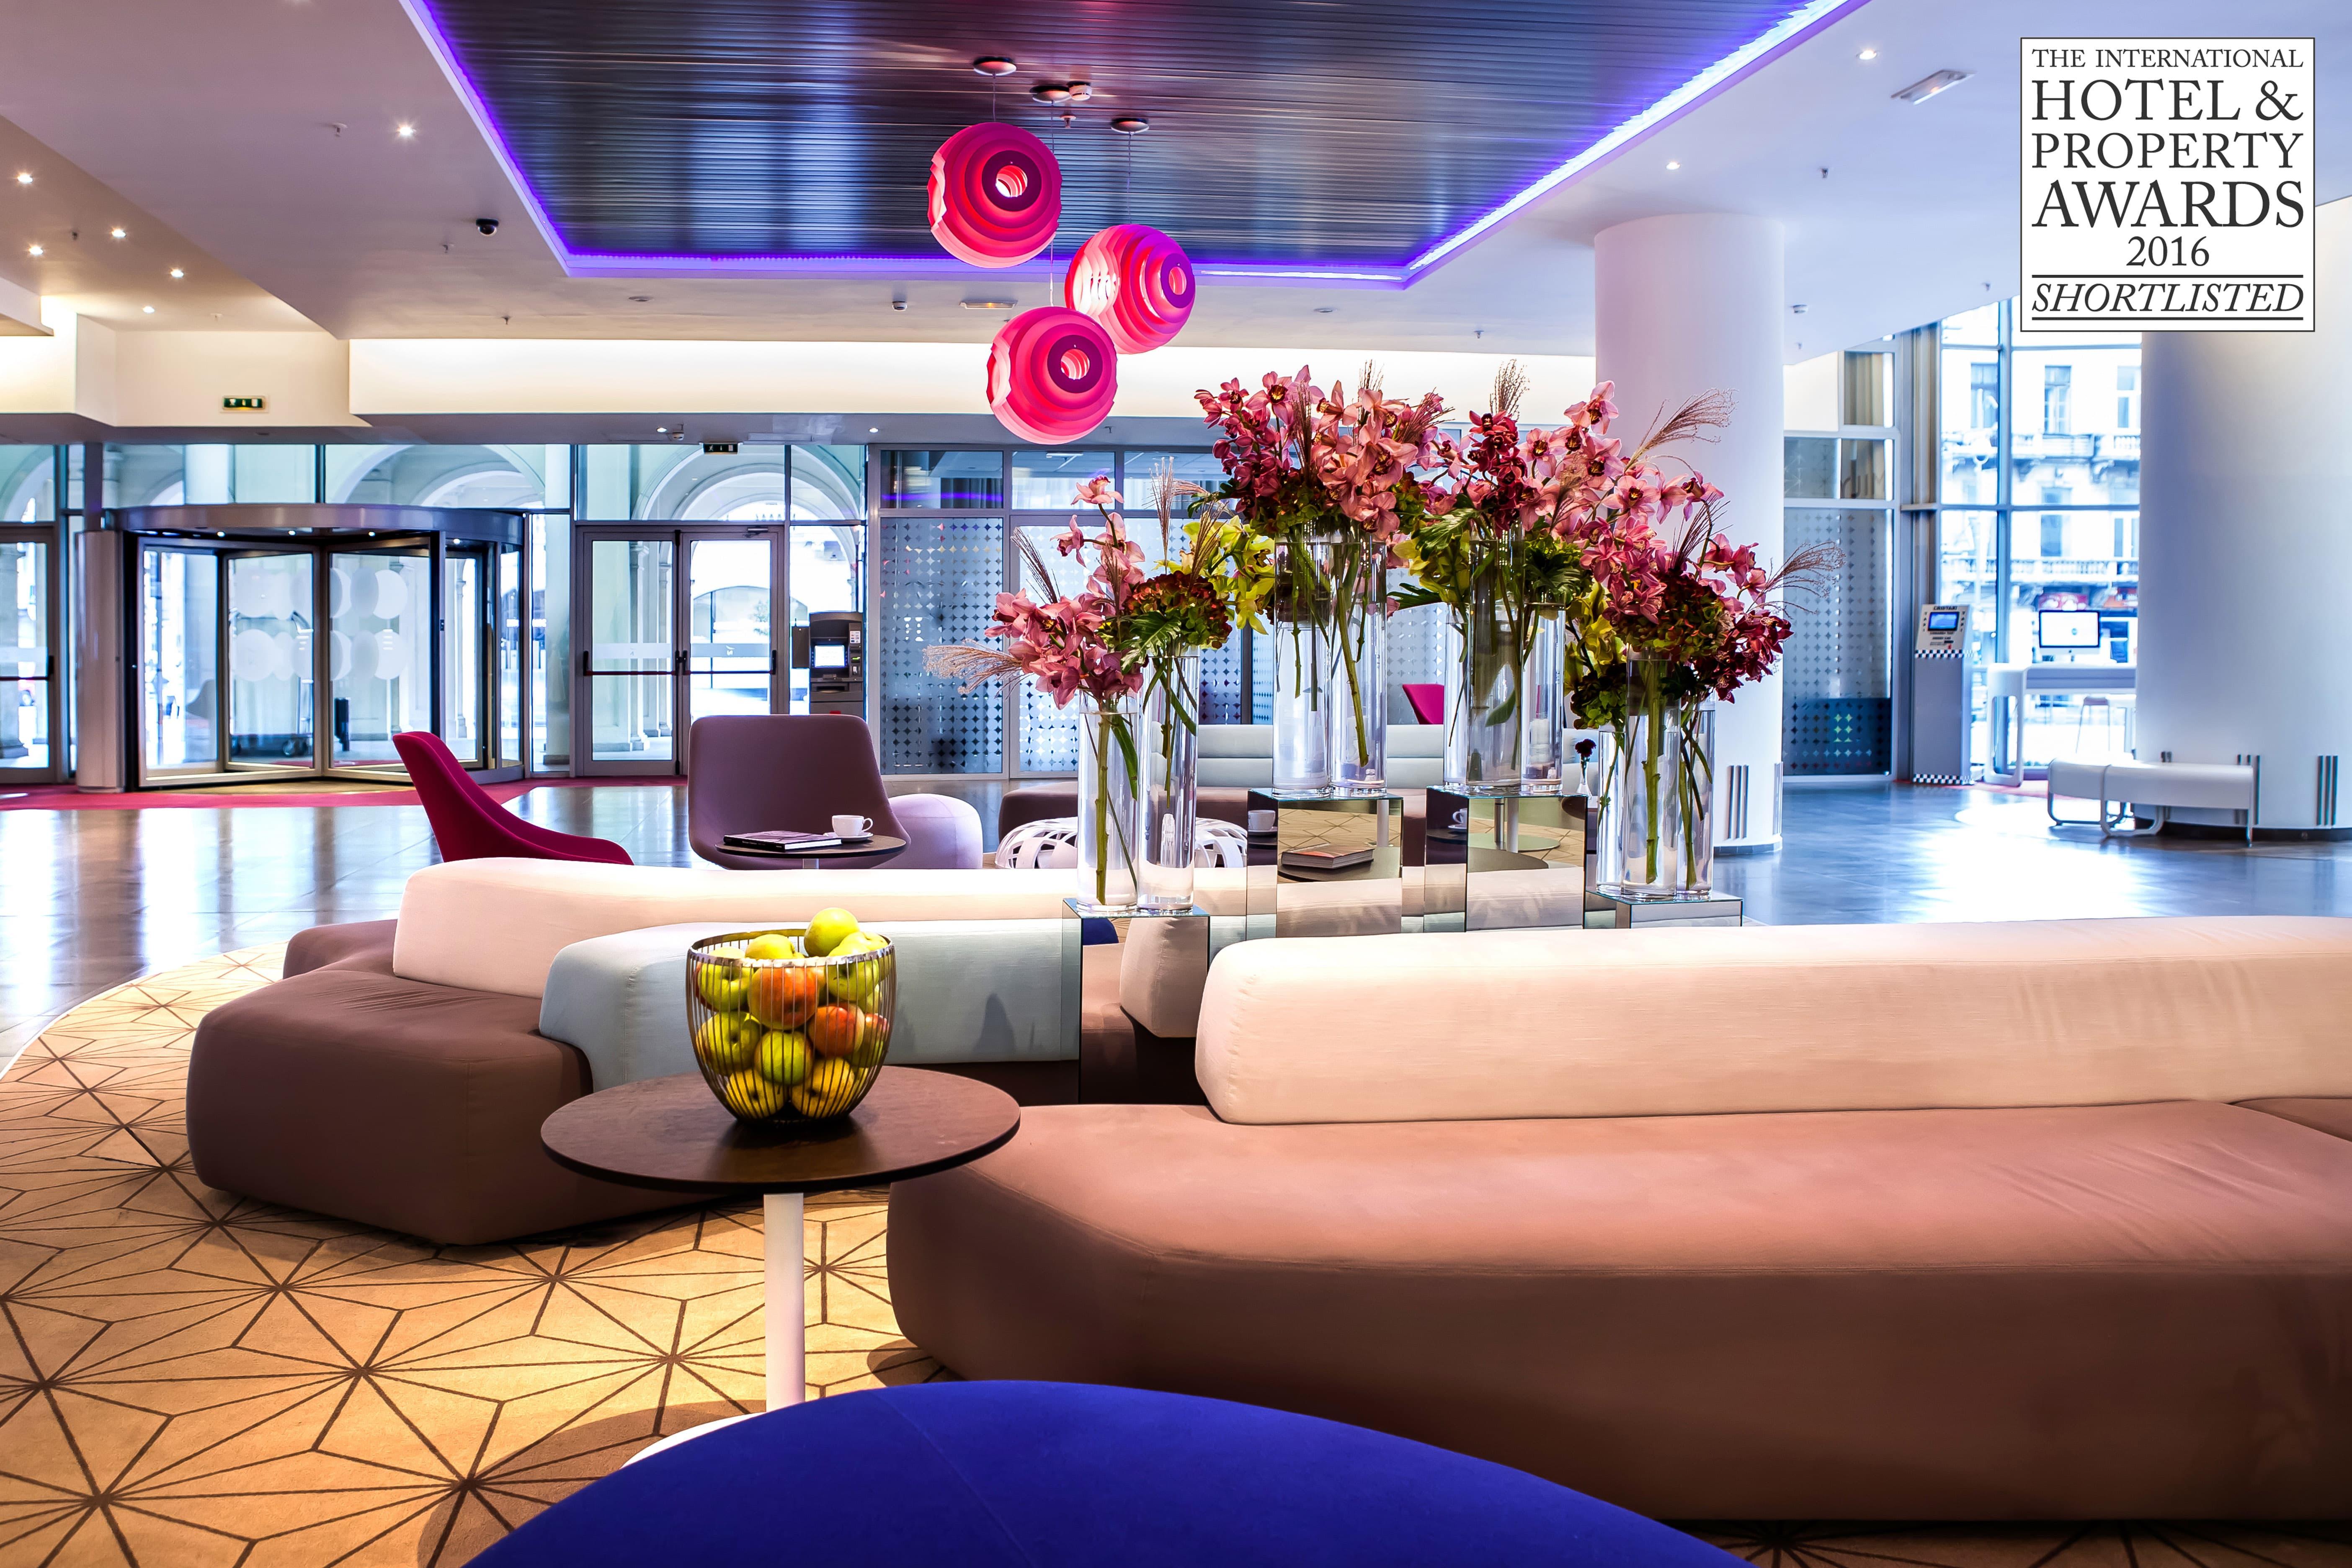 Lobby hotel novotel bucharest modern interior design for Hotel design 2016